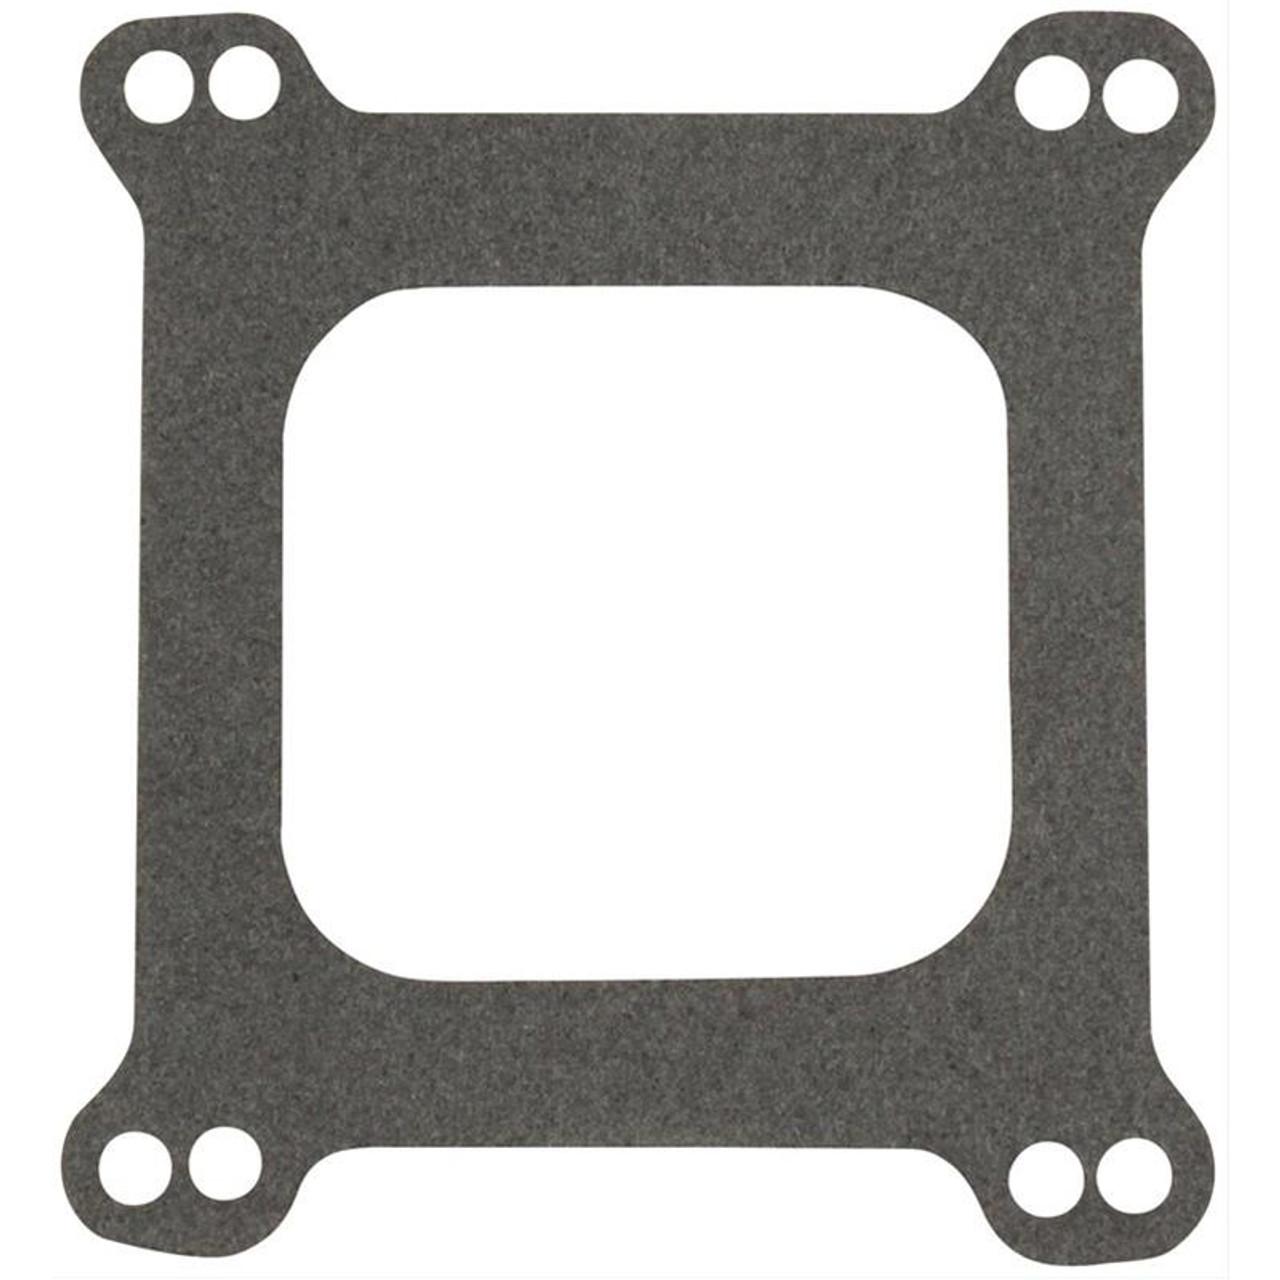 4150 Base Plate Gasket